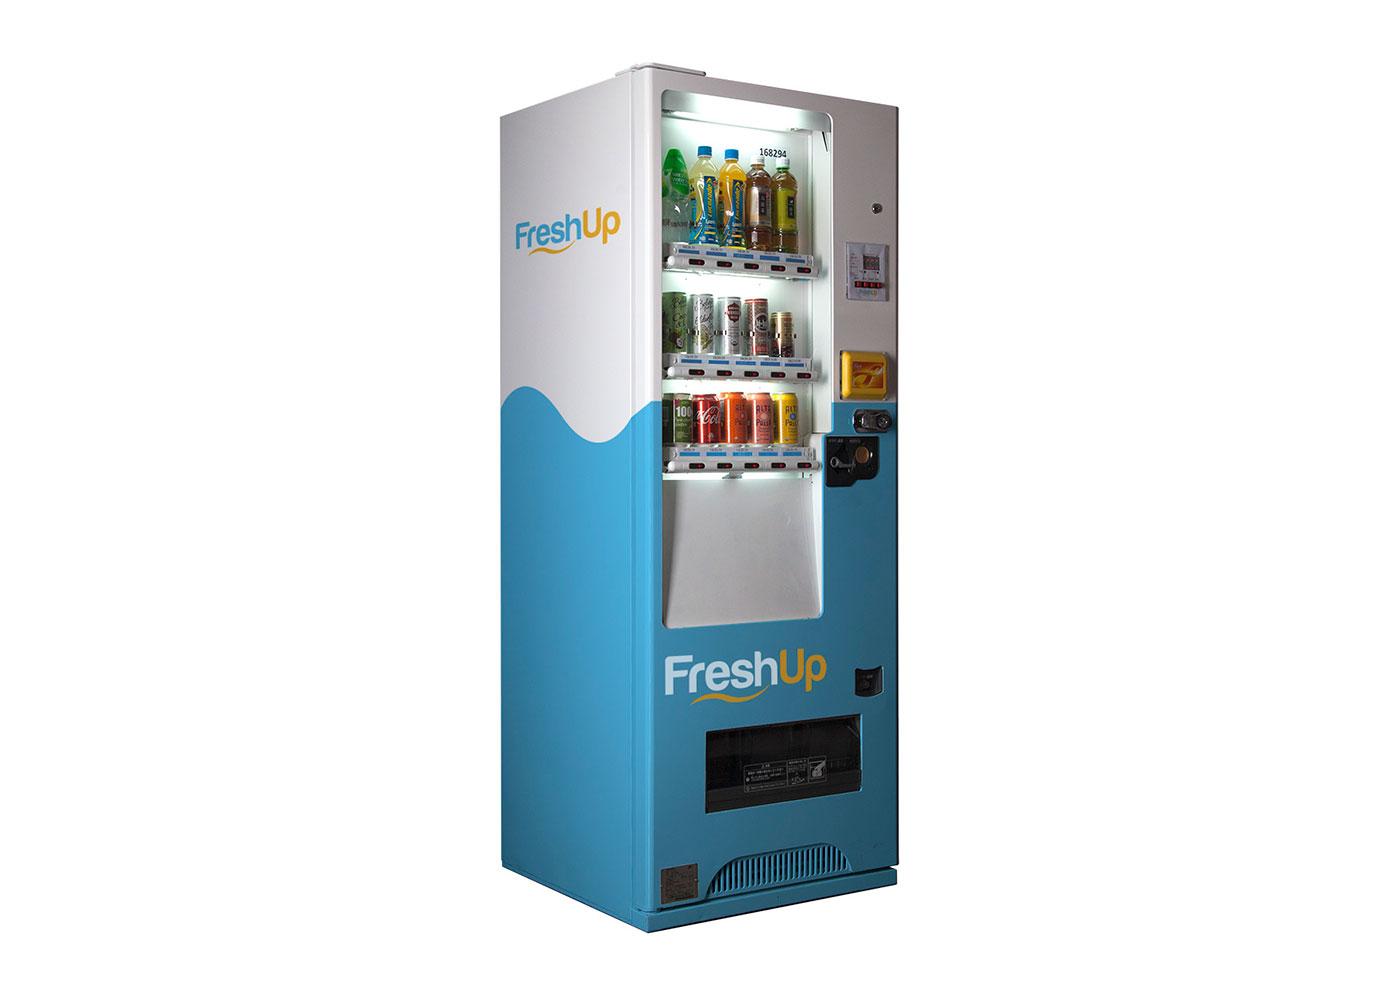 FreshUp, drinks, vending machine, beverages, fast, convenient, smart